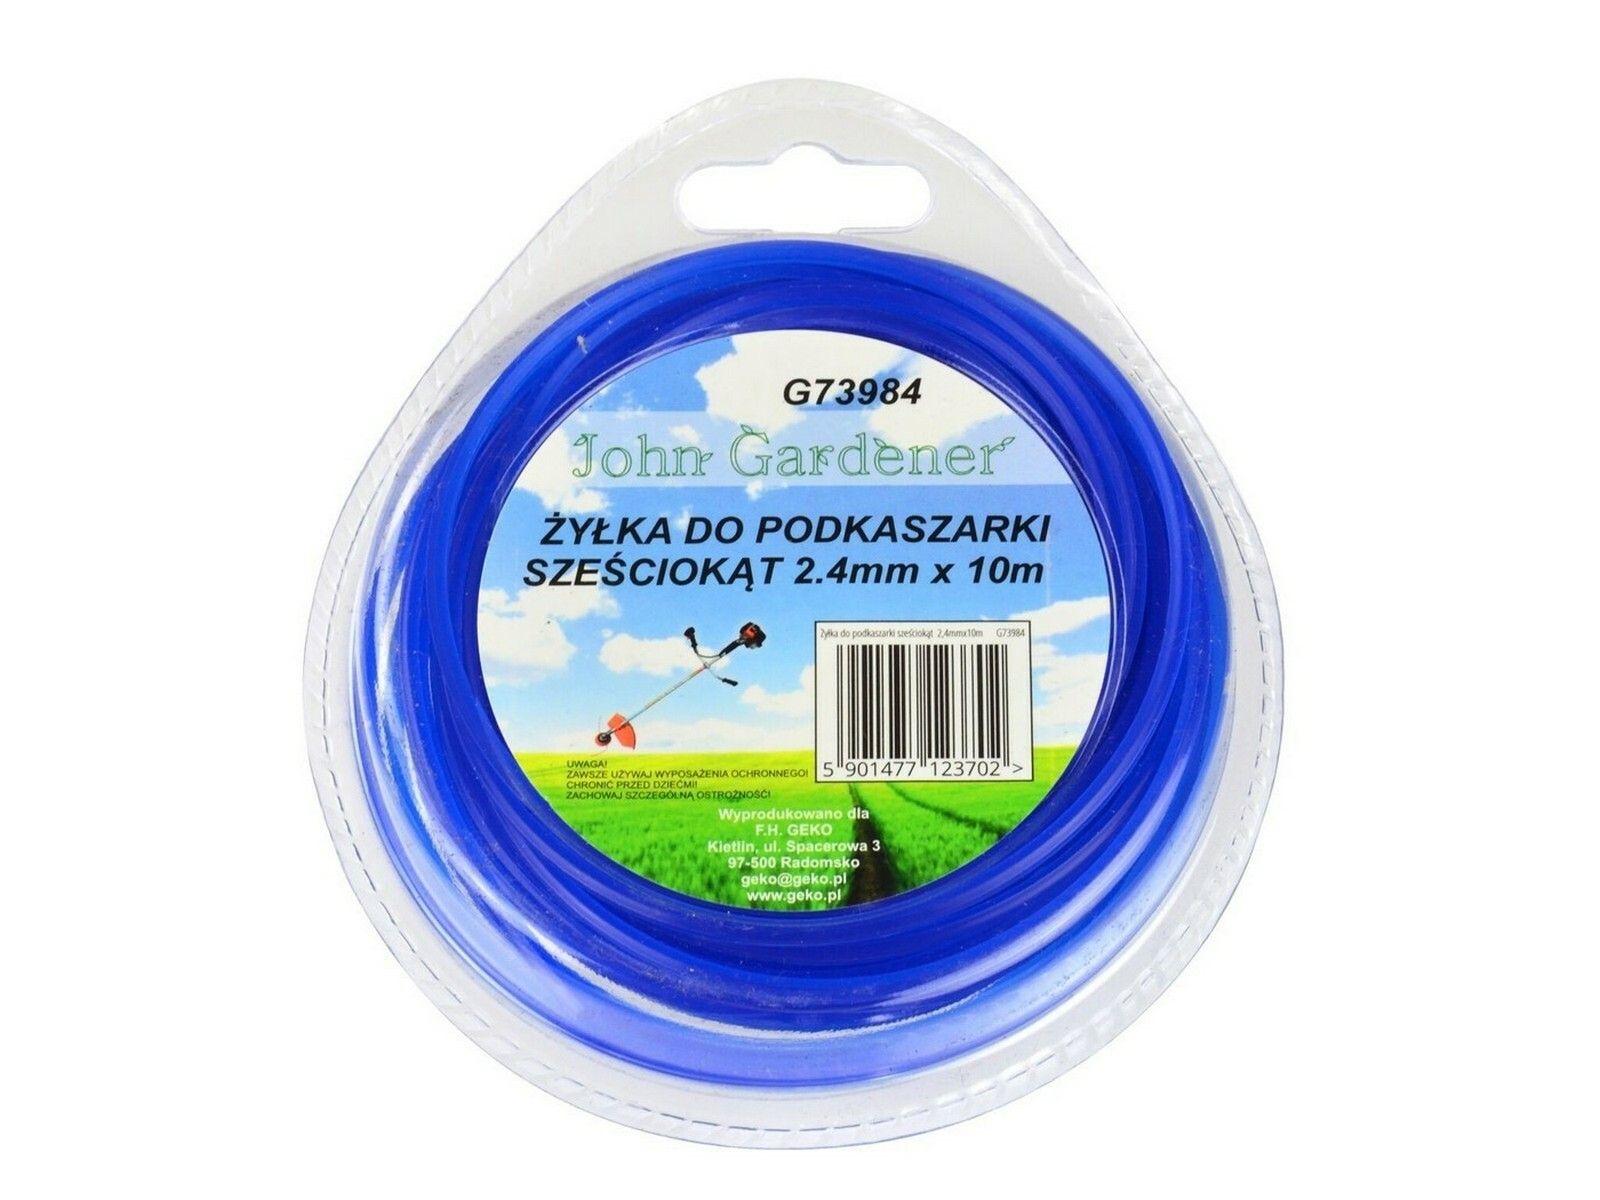 Struna do sekačky modrá, 2,4mm, 10m, hvězdicový profil, nylon, GEKO G73985